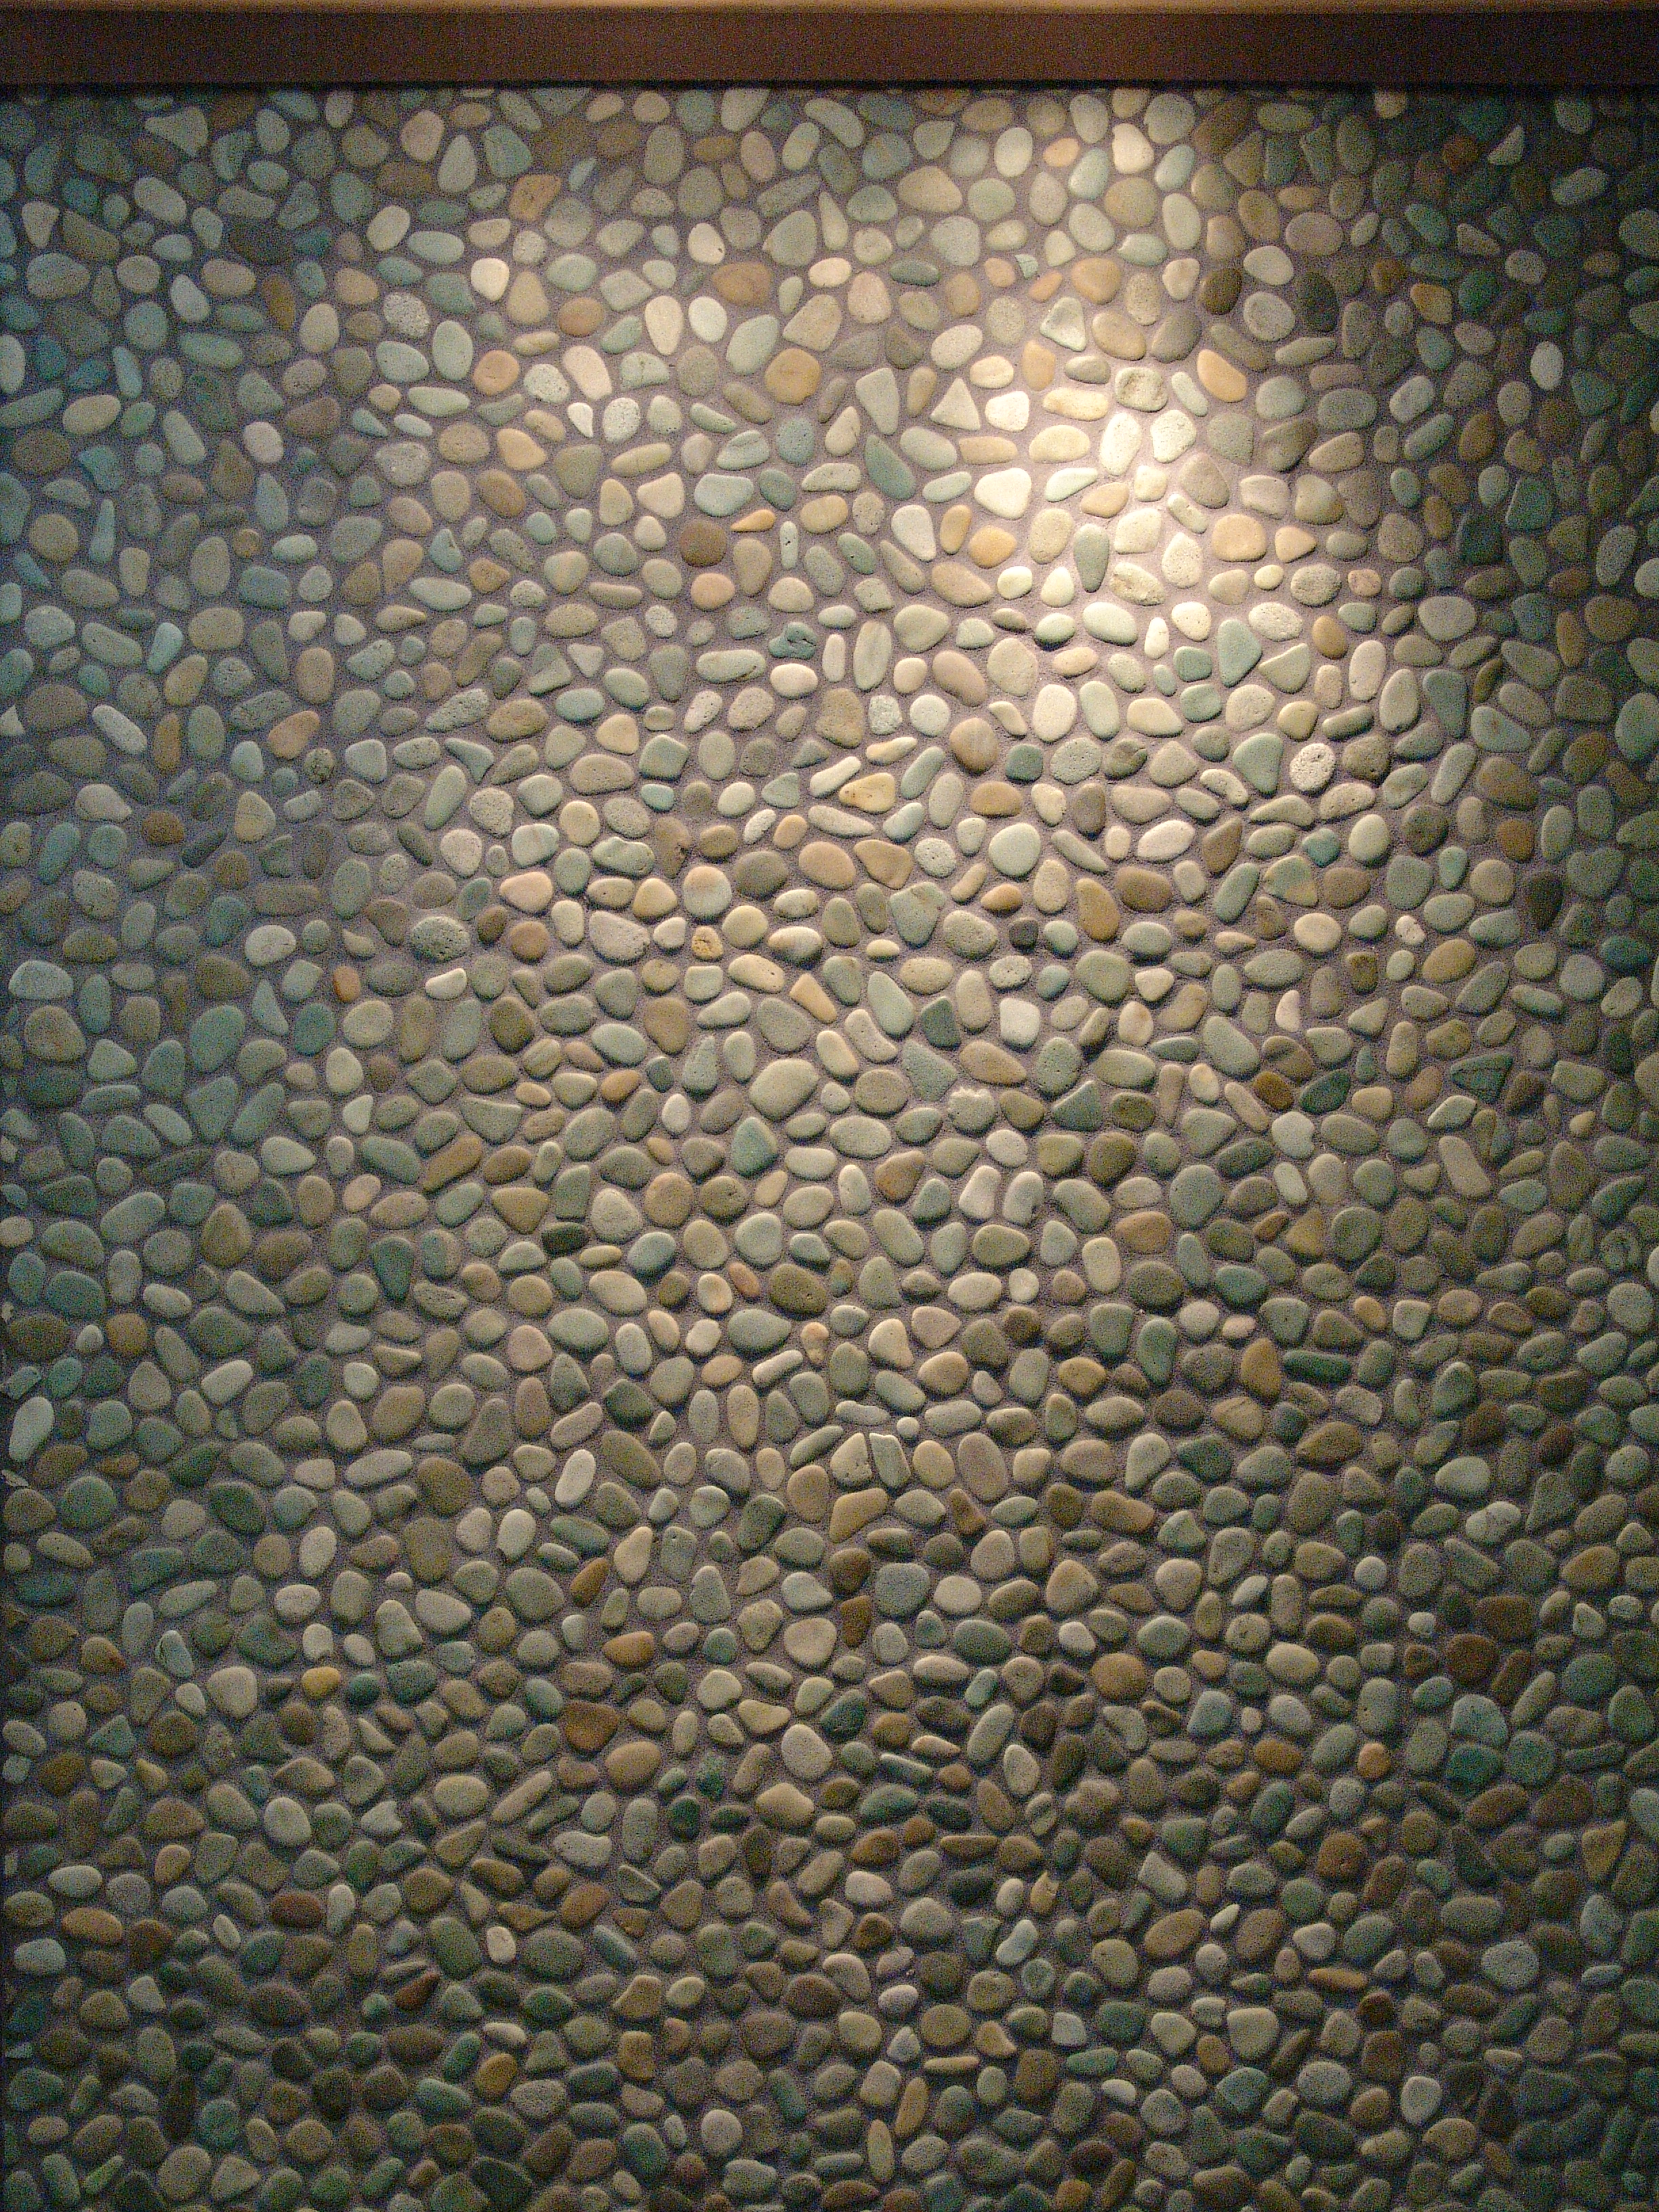 007-pebble mosaic fountain at entrance to salon_3896.JPG